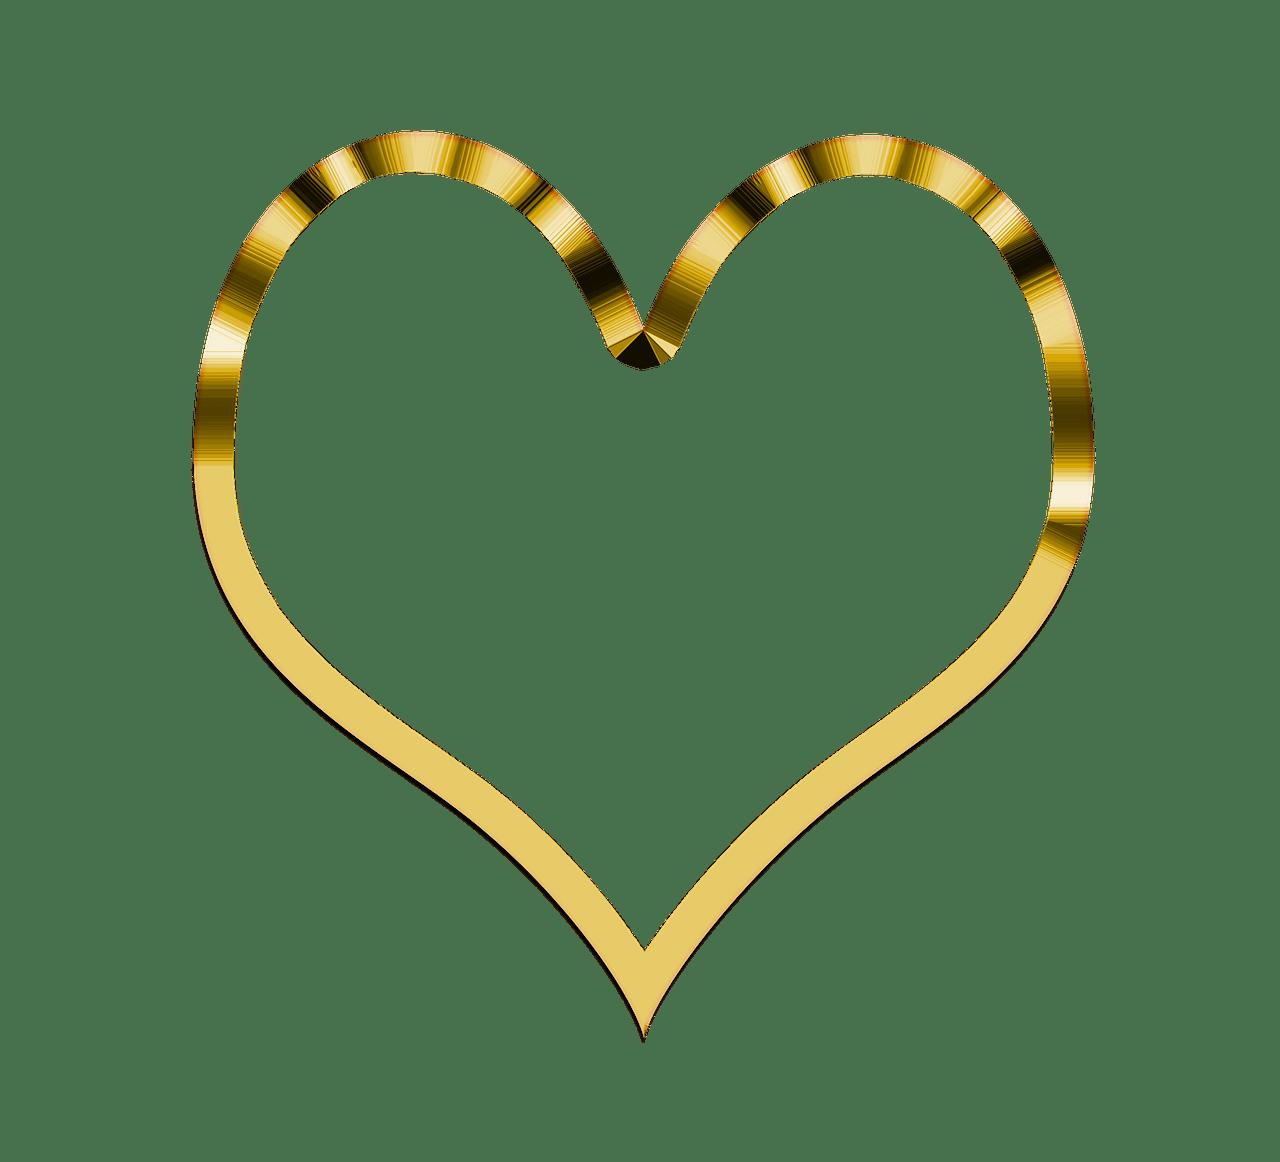 Golden transparent png stickpng. Clipart heart simple